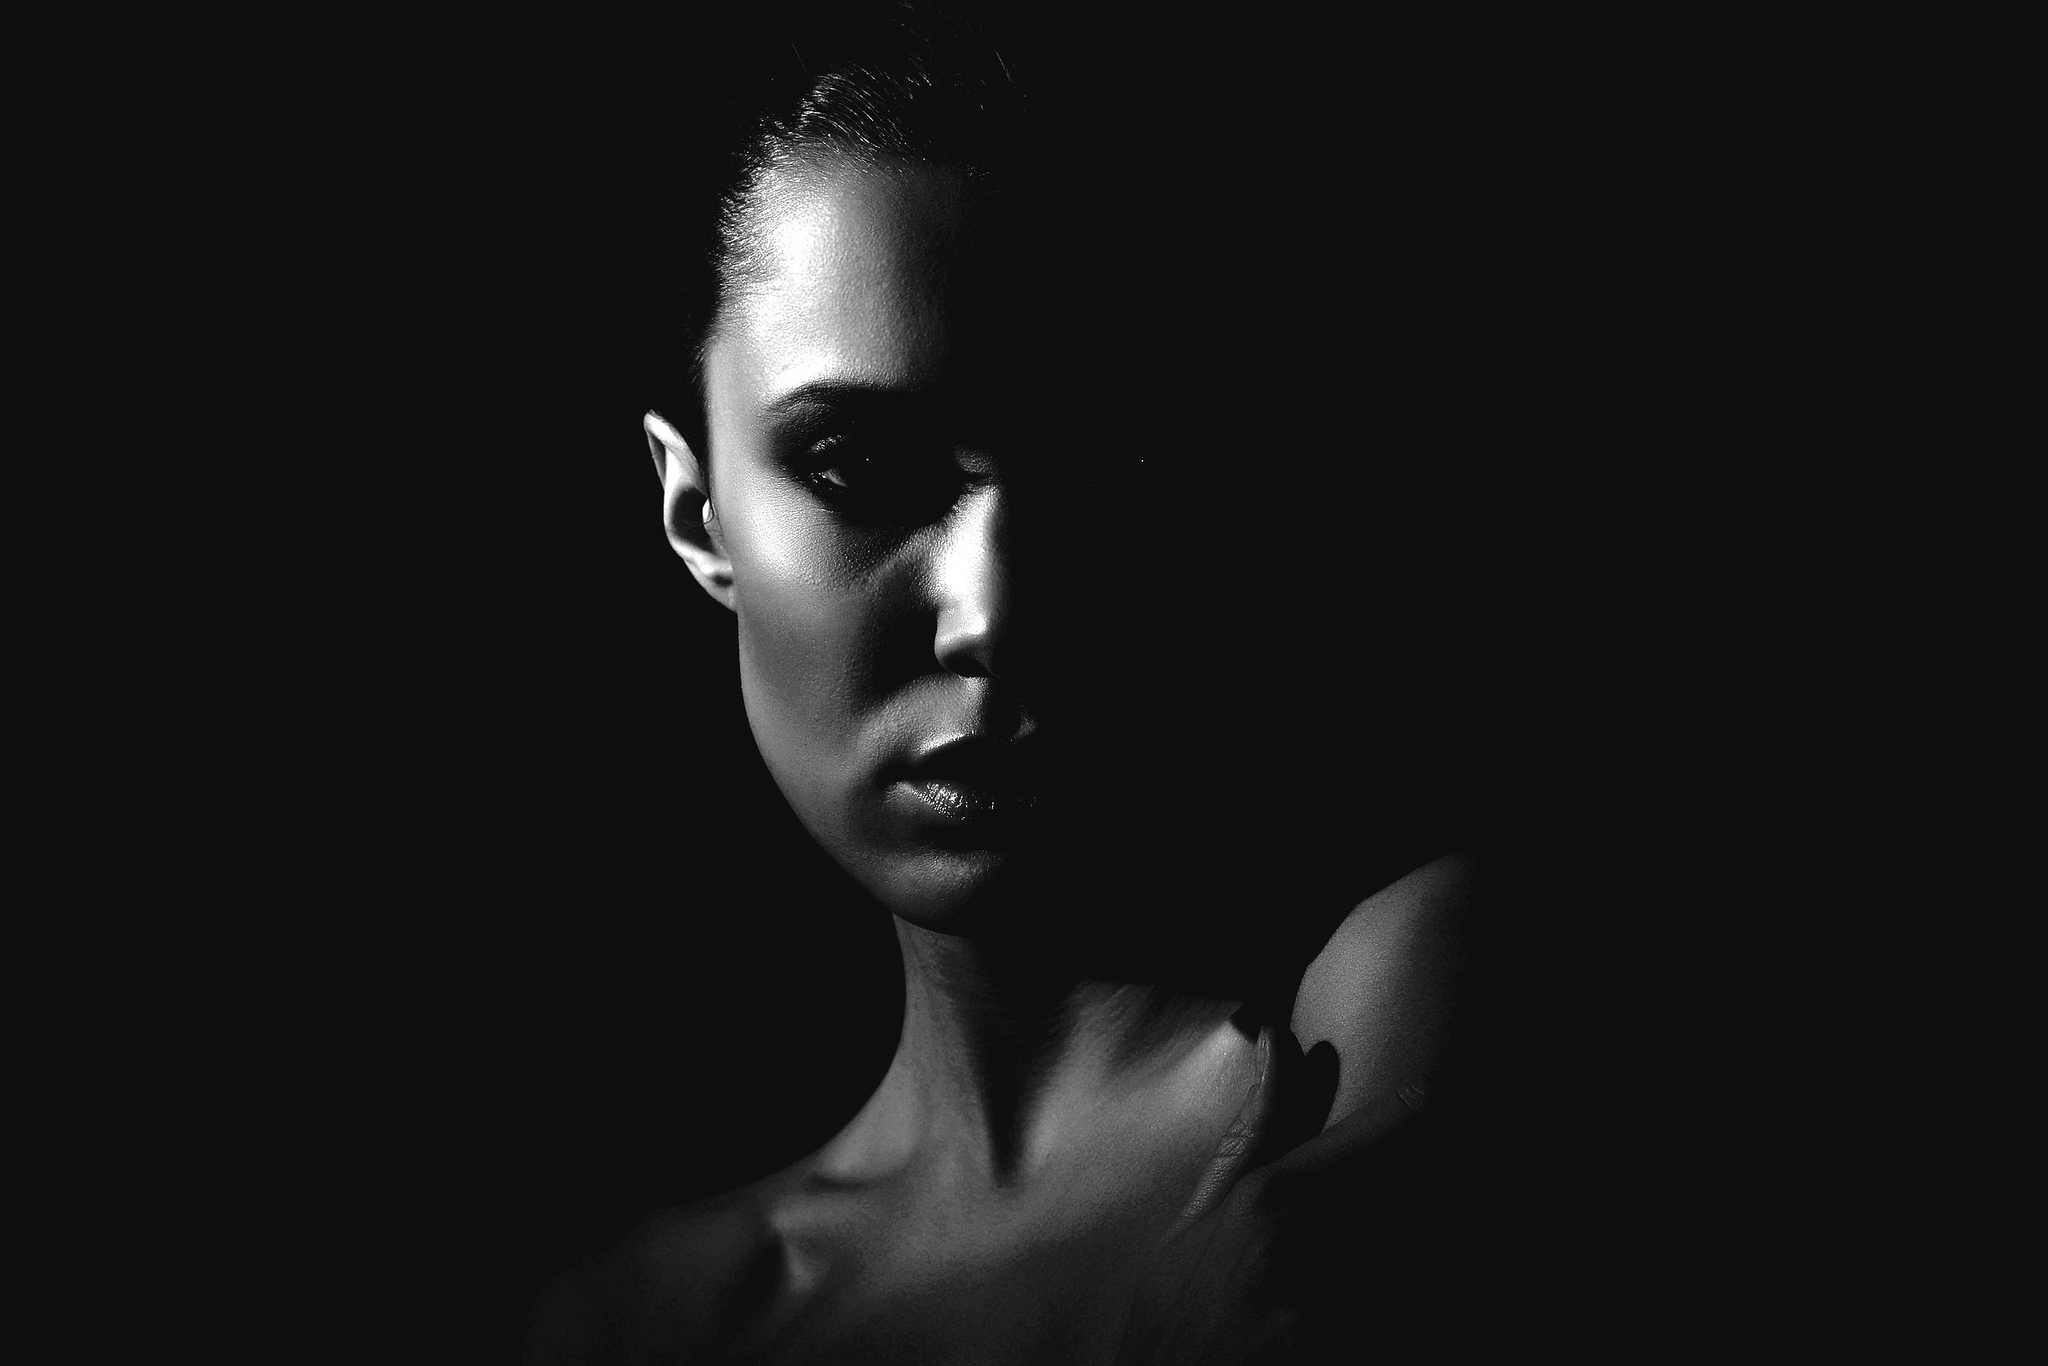 Картинка женщина на черном фоне